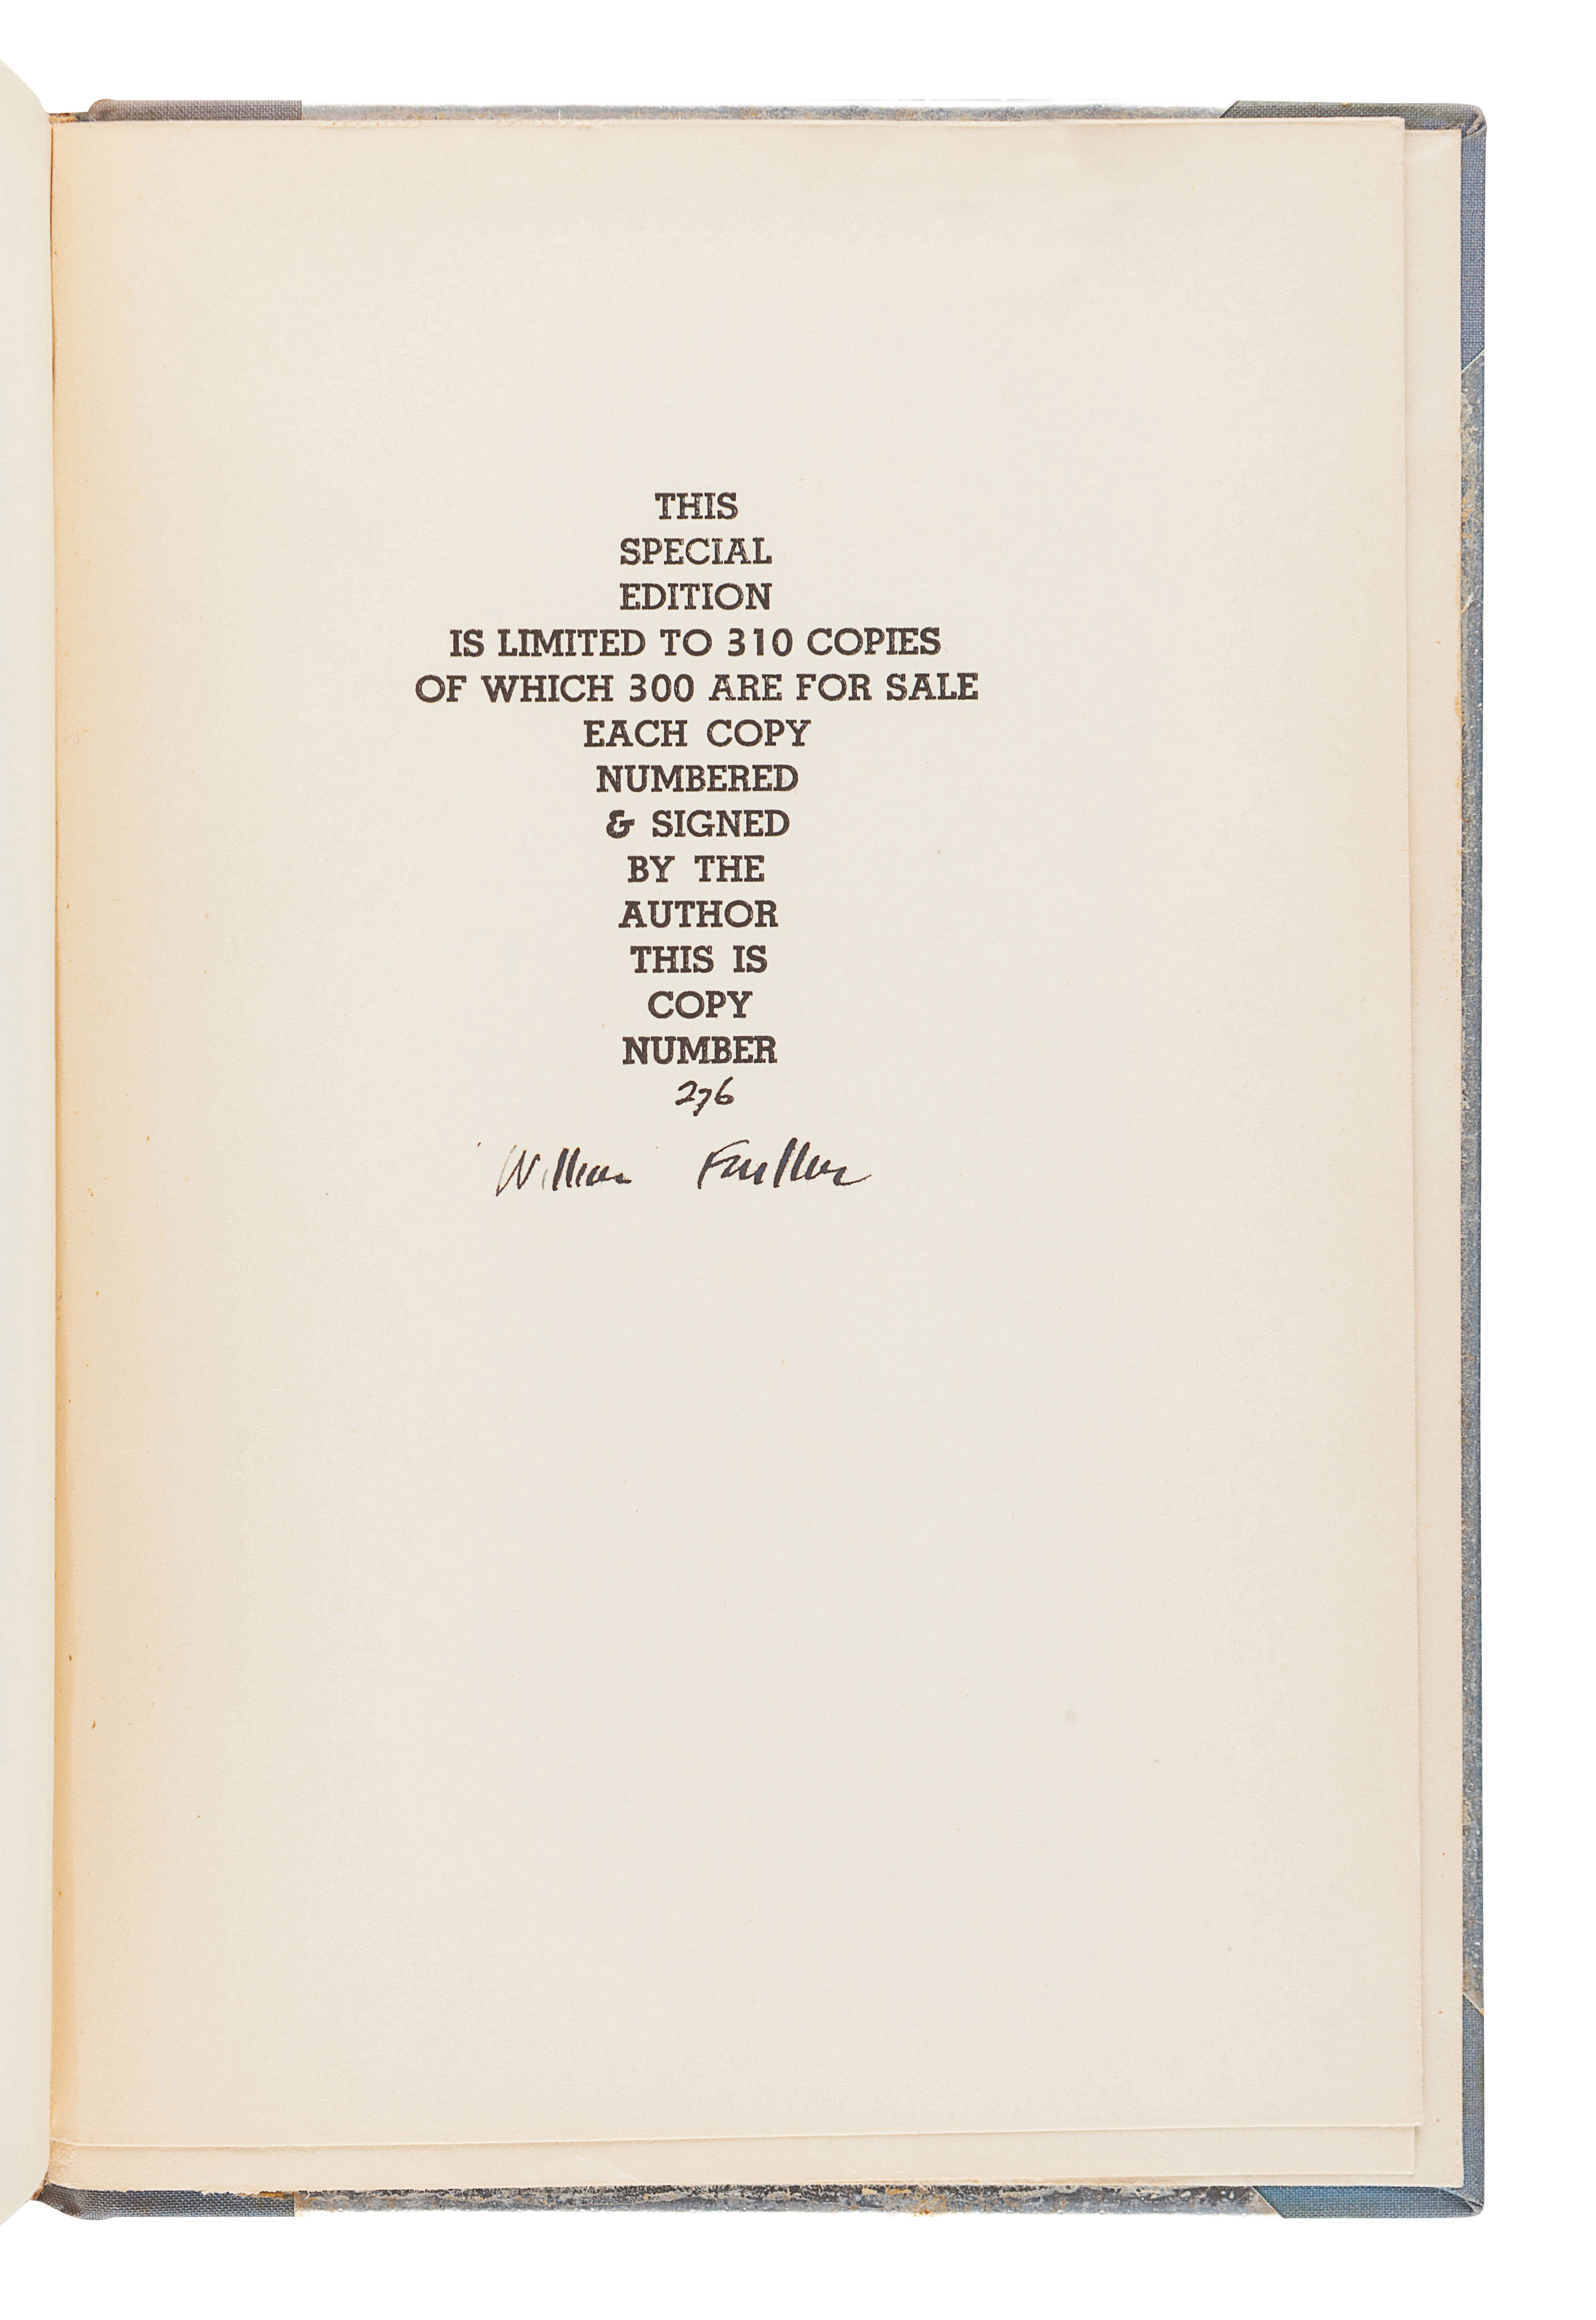 FAULKNER, William (1897-1962). Pylon. New York: Harrison Smith and Robert Haas, 1935.